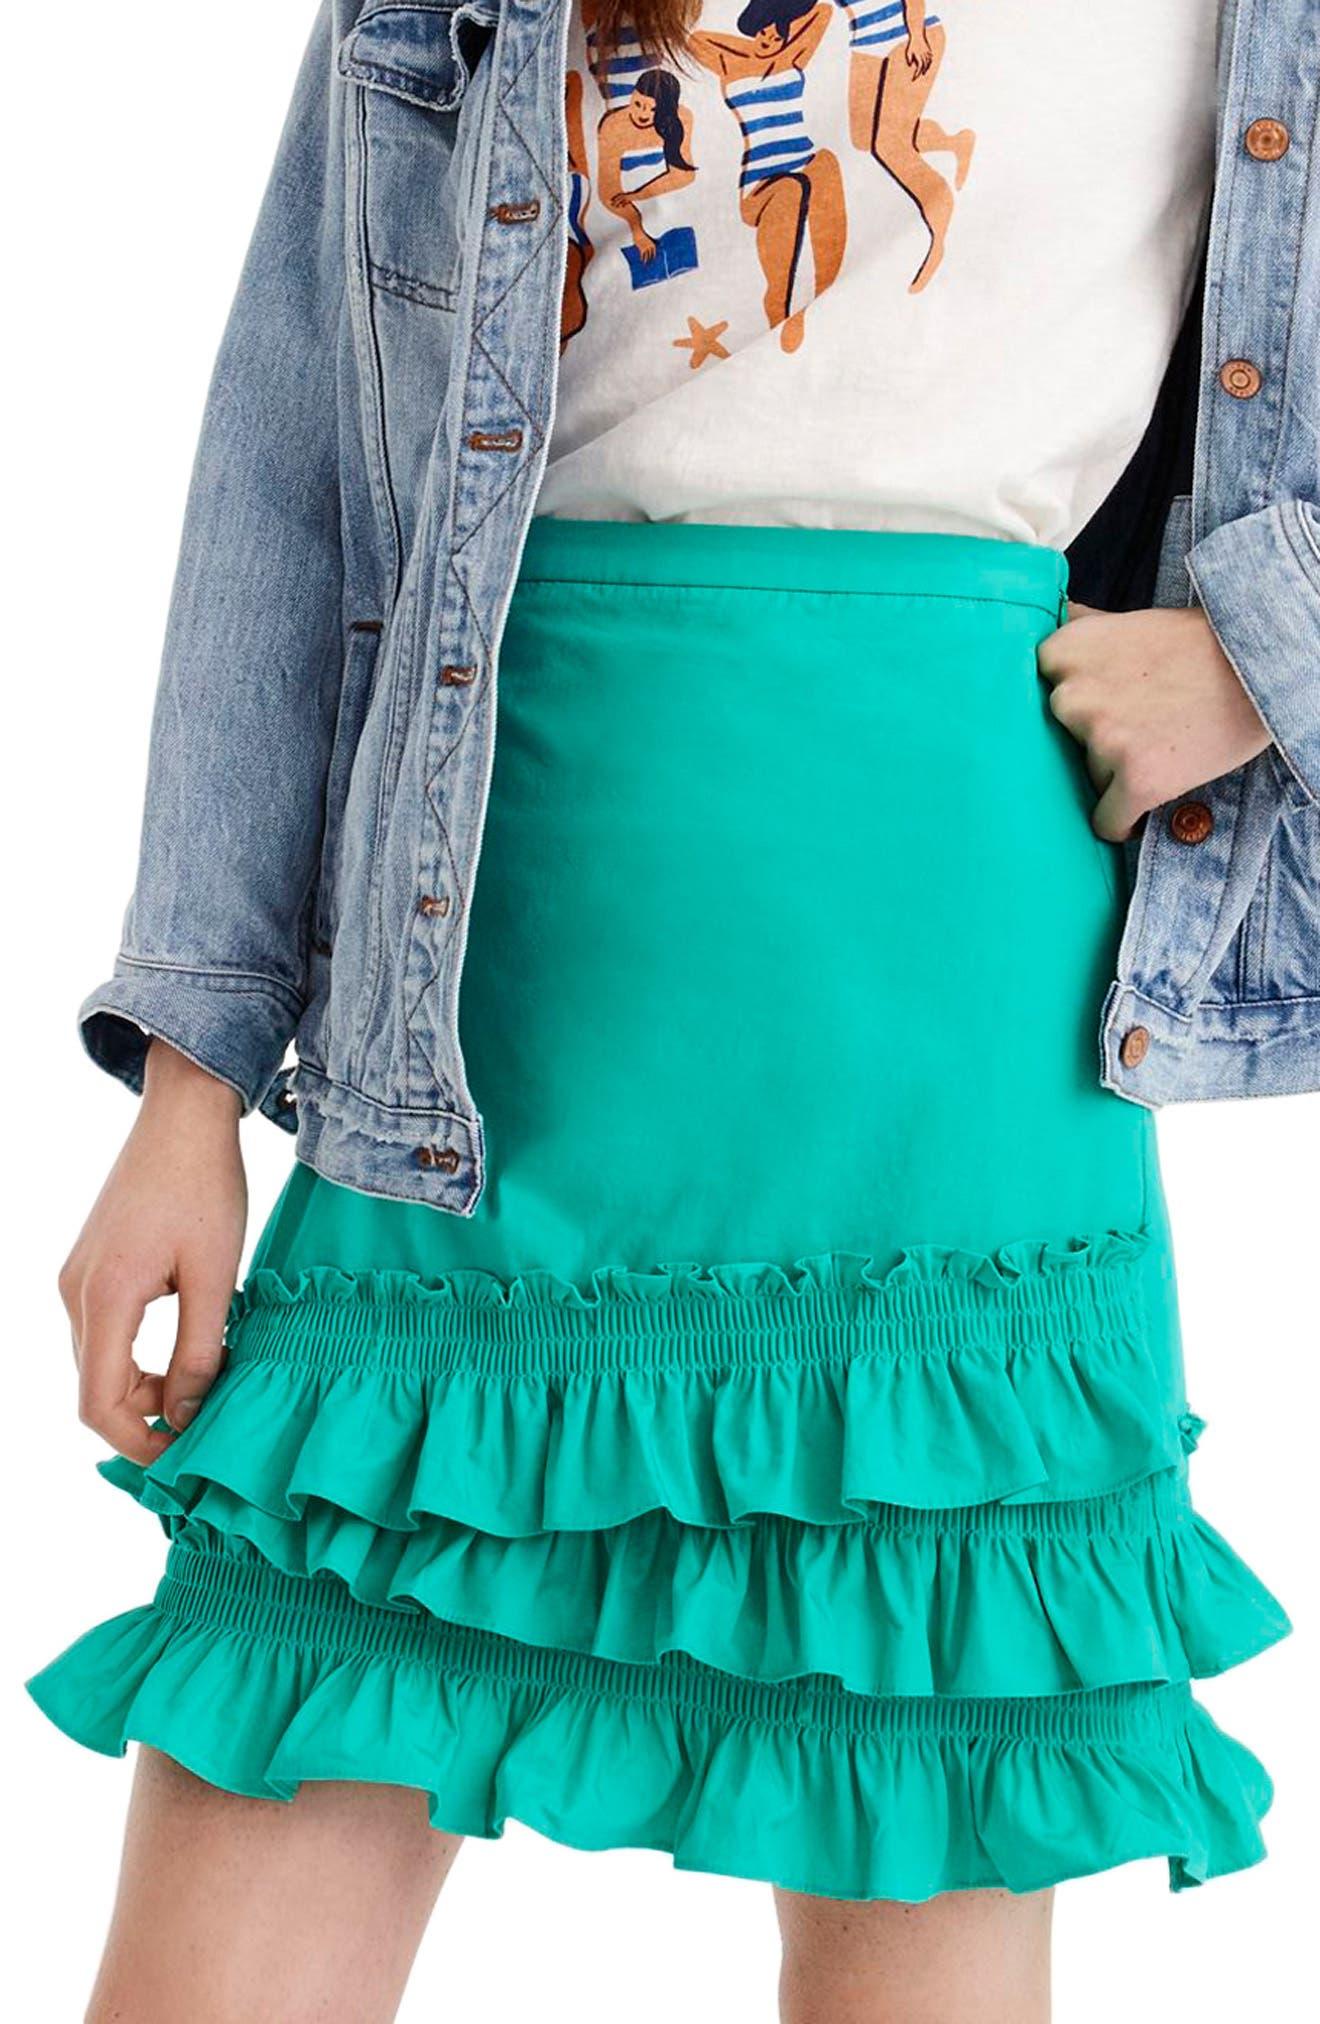 J.Crew Baby Armada Cotton Poplin Ruffle Mini Skirt (Regular & Petite)